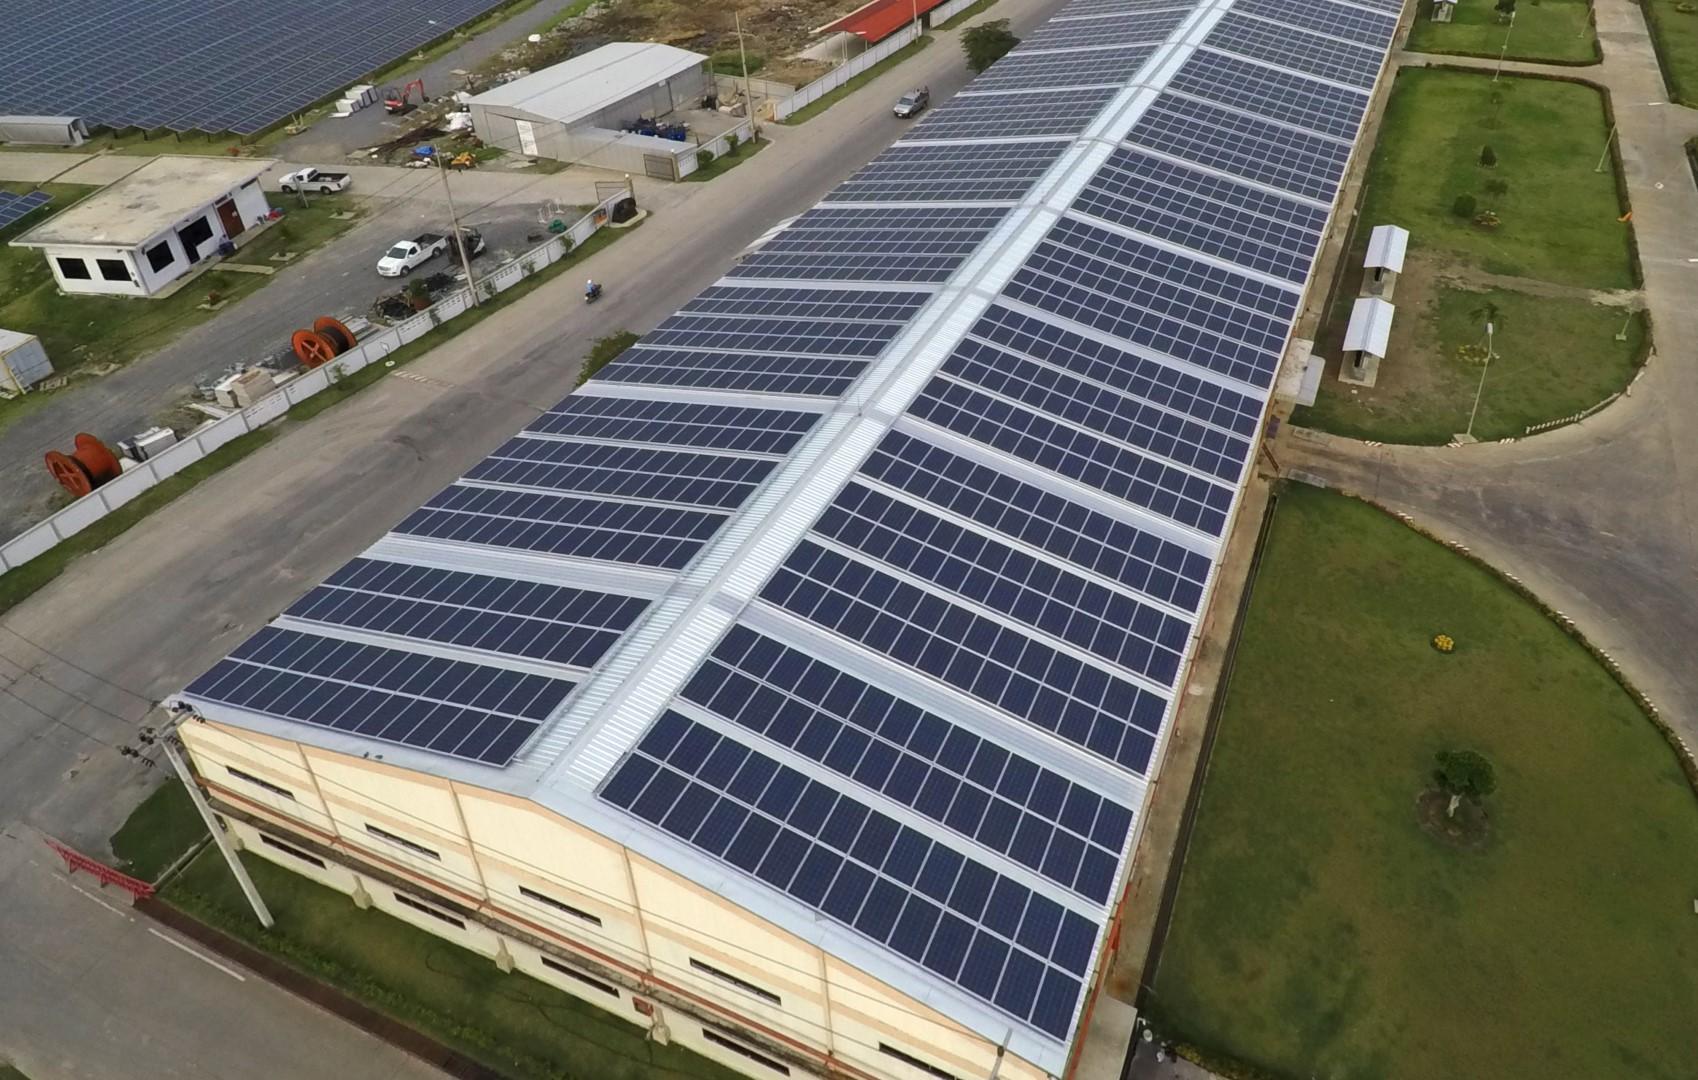 rooftop-solar-panels-Large.jpg